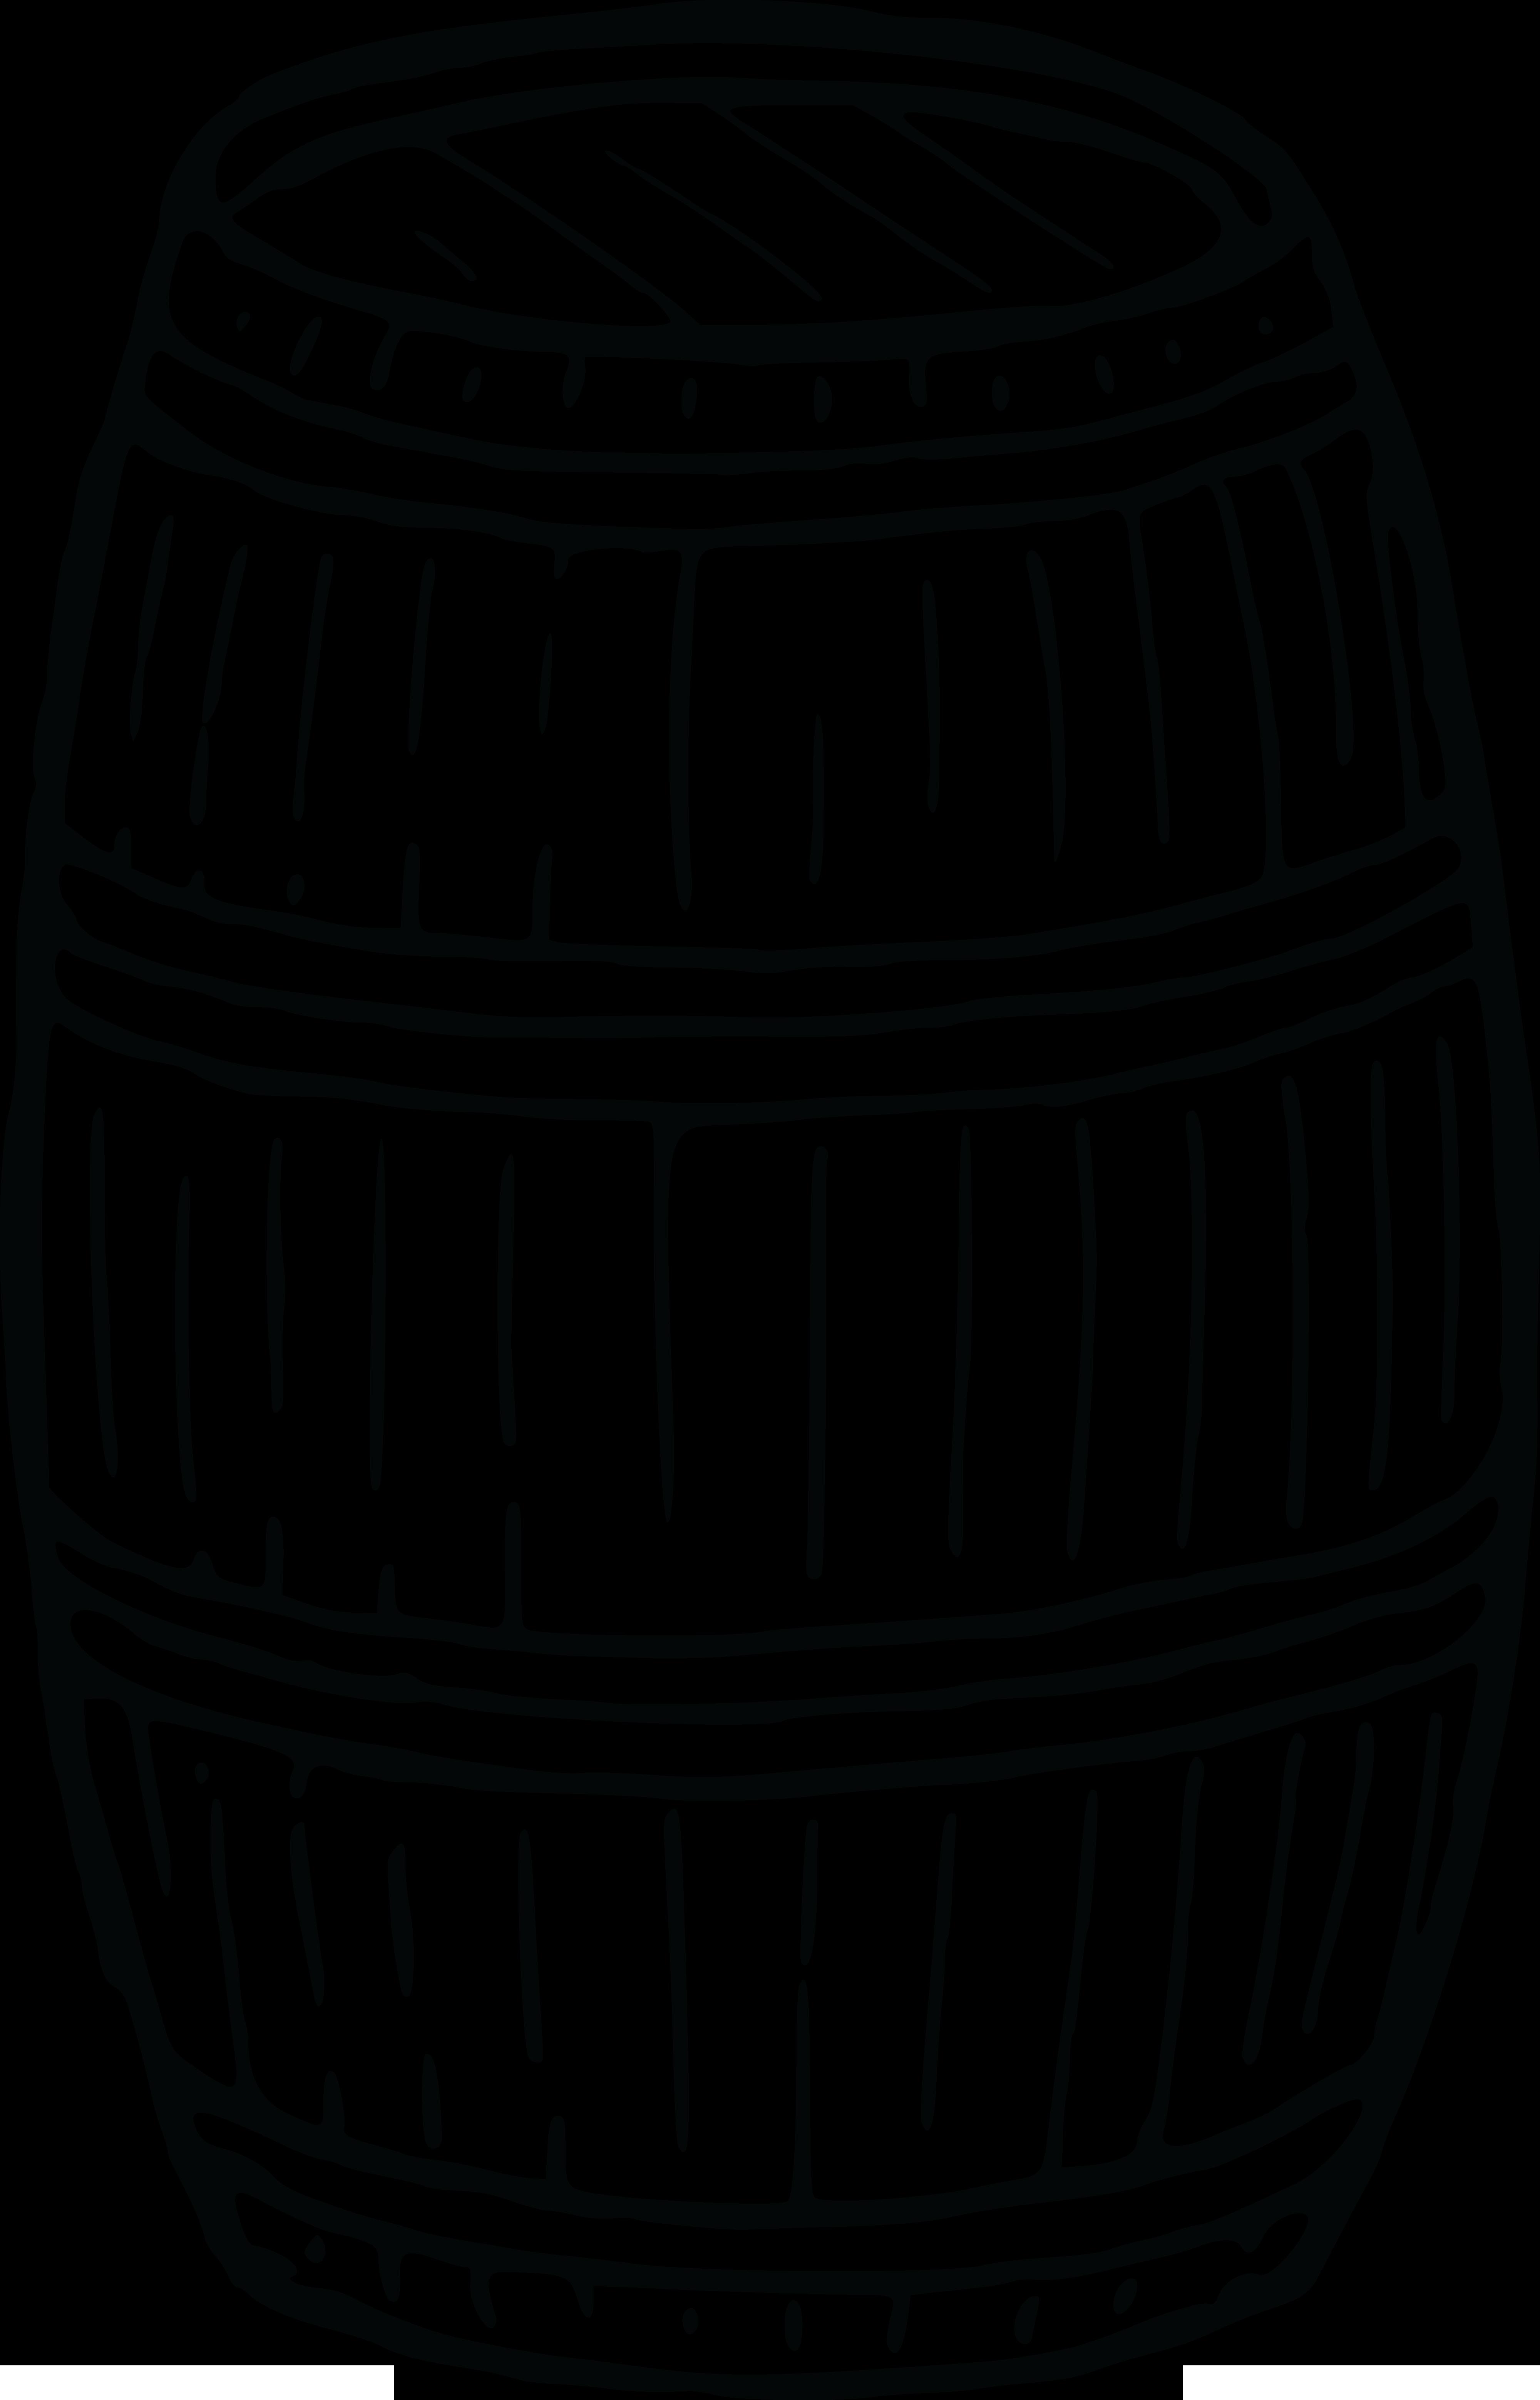 Oil clipart dram, Oil dram Transparent FREE for download on.